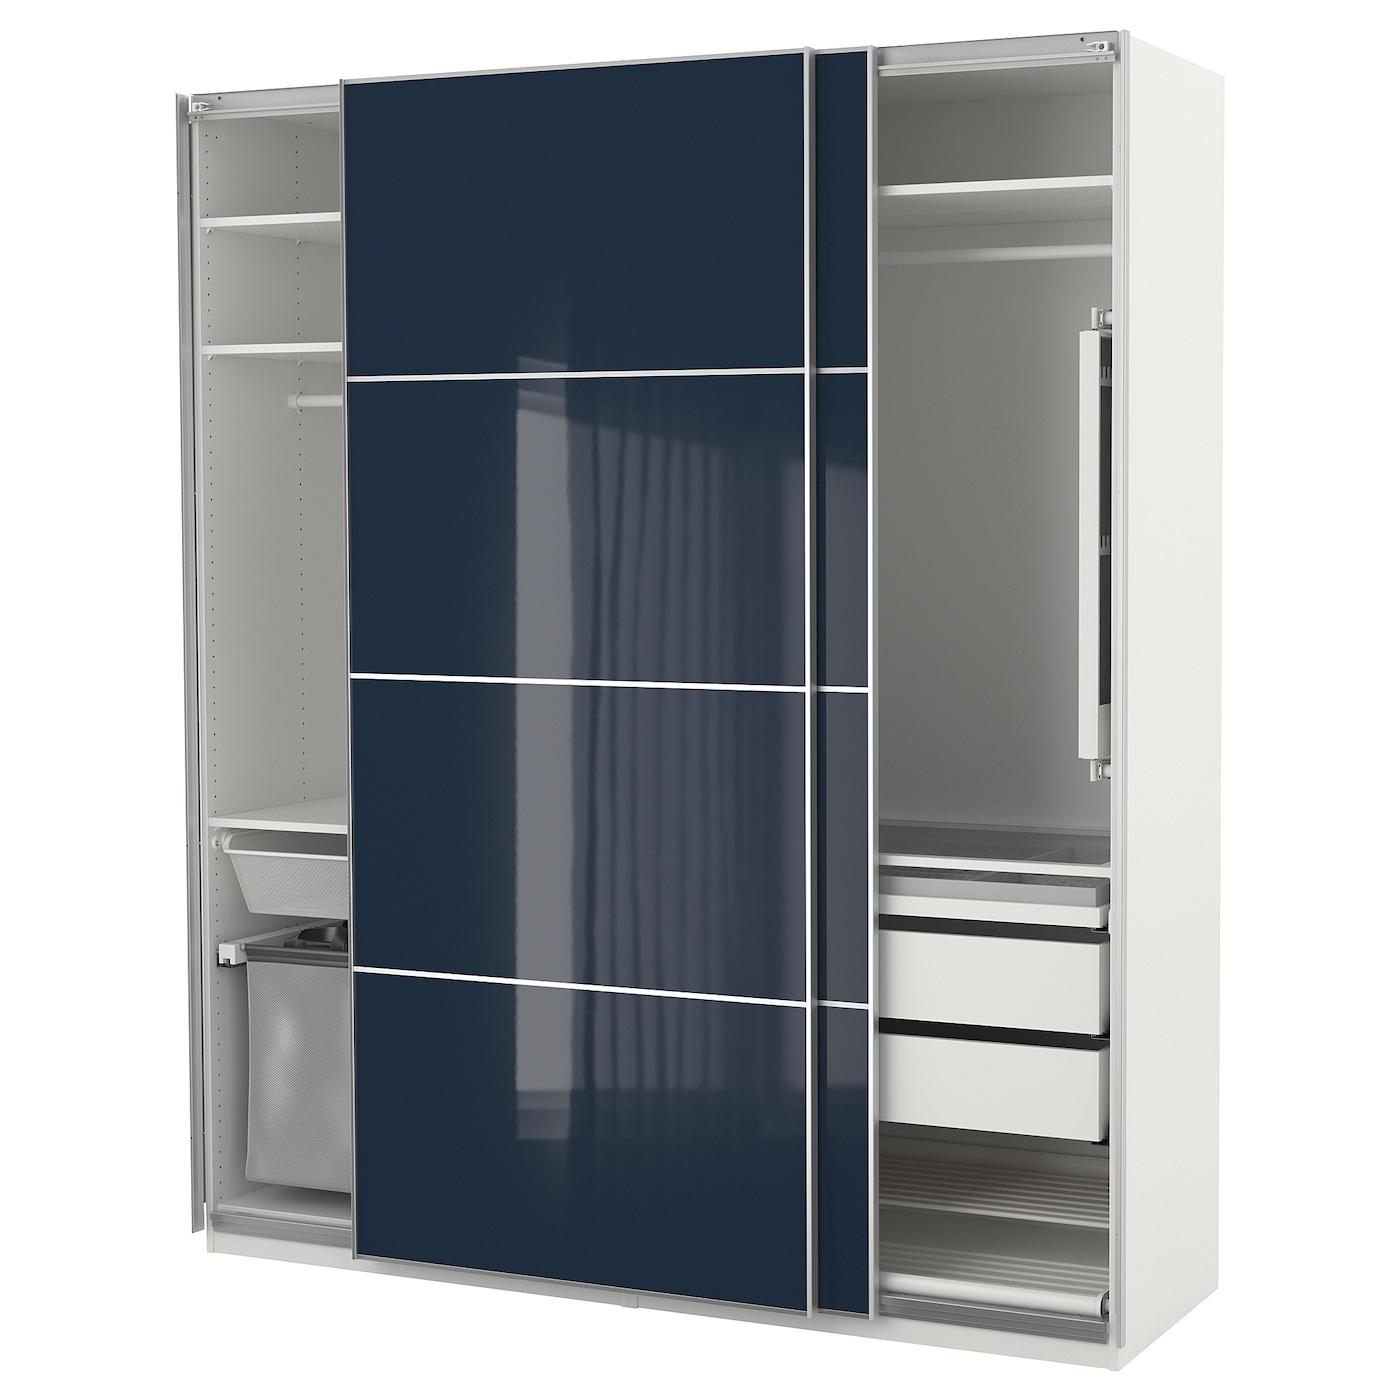 ikea ordnungssysteme schlafzimmer schlafzimmer porta kommode kiefer farben 2017 ikea t ren. Black Bedroom Furniture Sets. Home Design Ideas